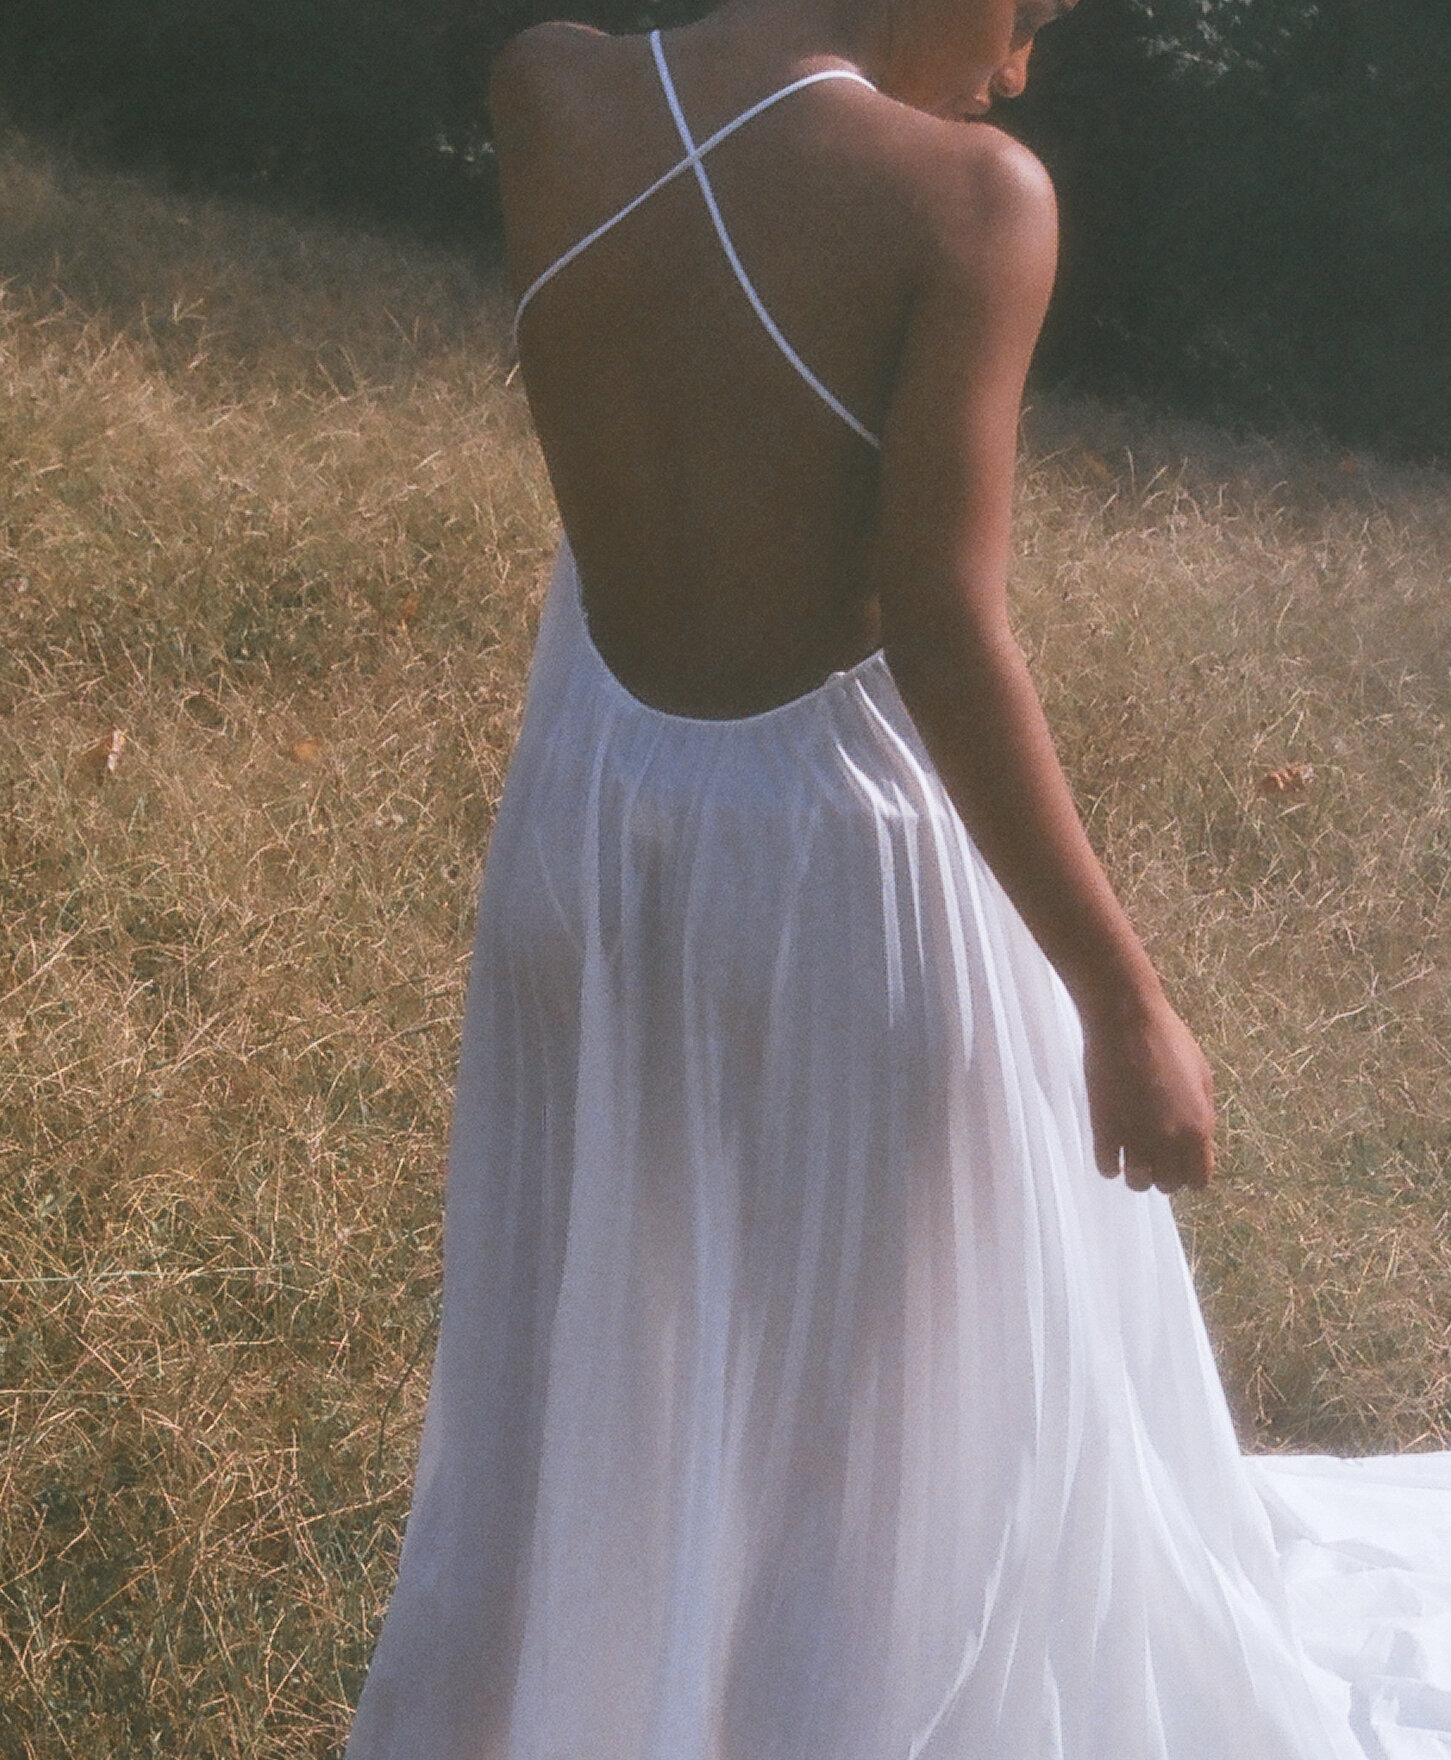 pleated house dress 3.jpg